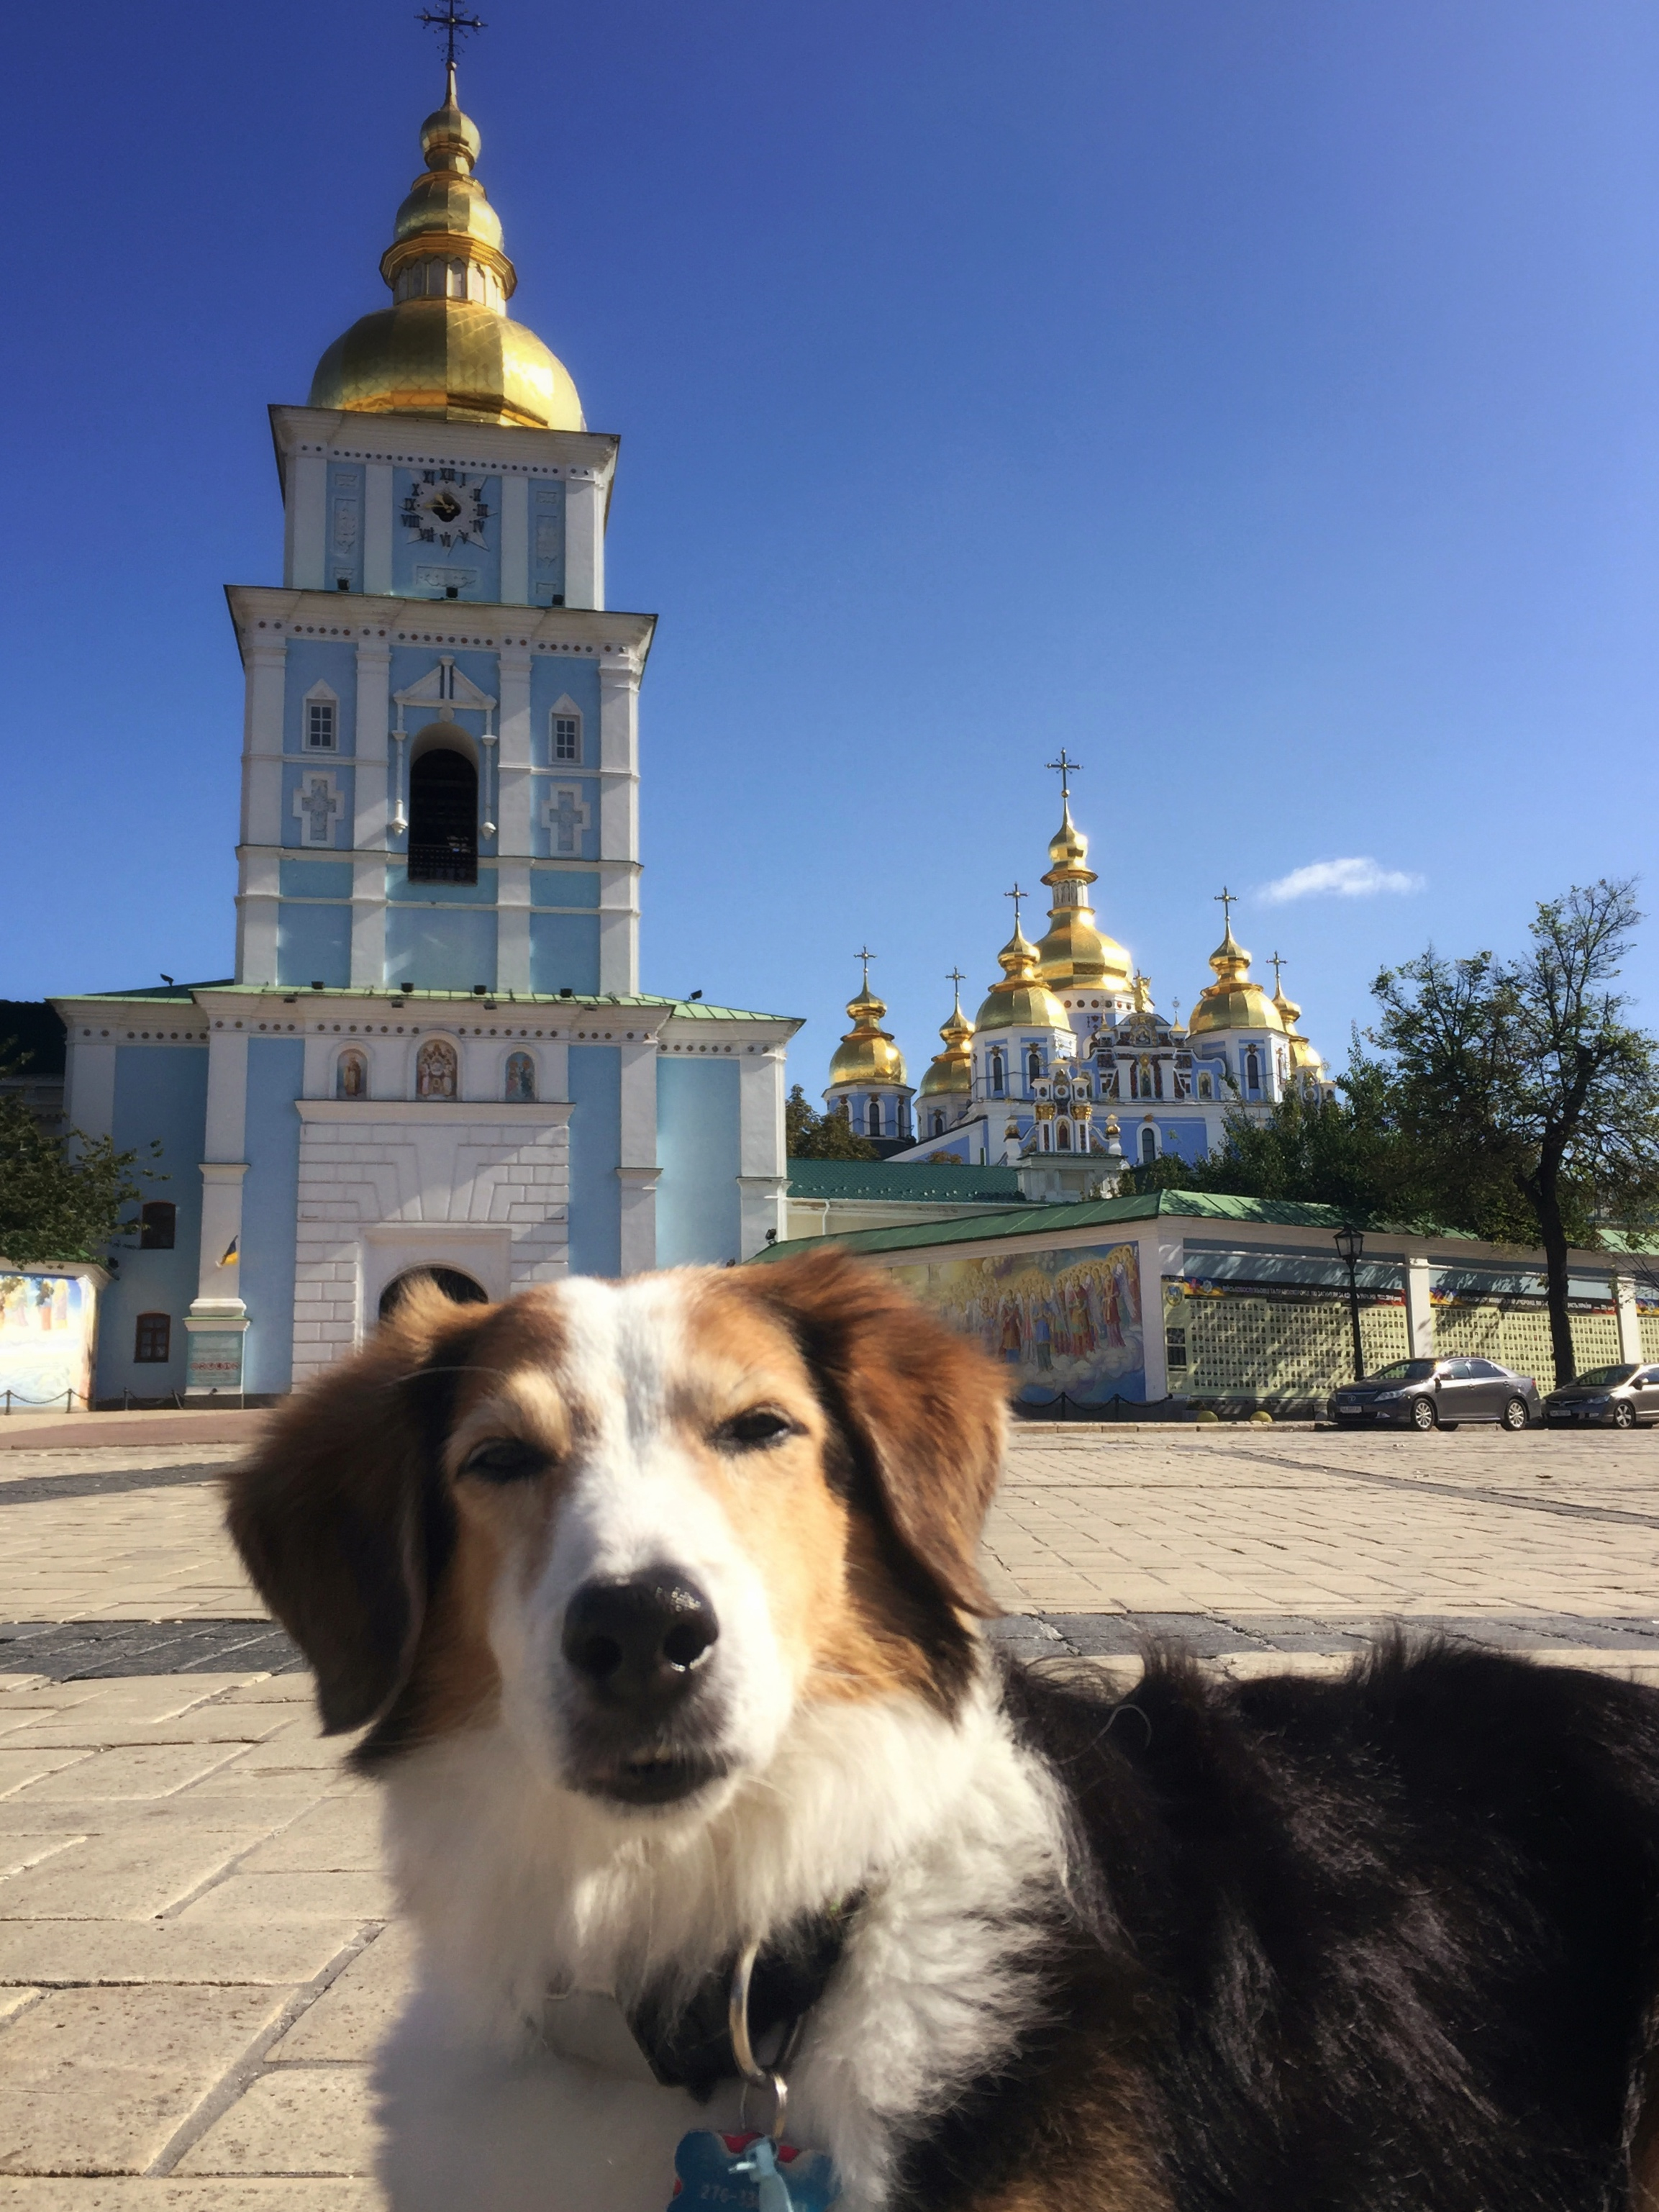 Ukrainian greetings!